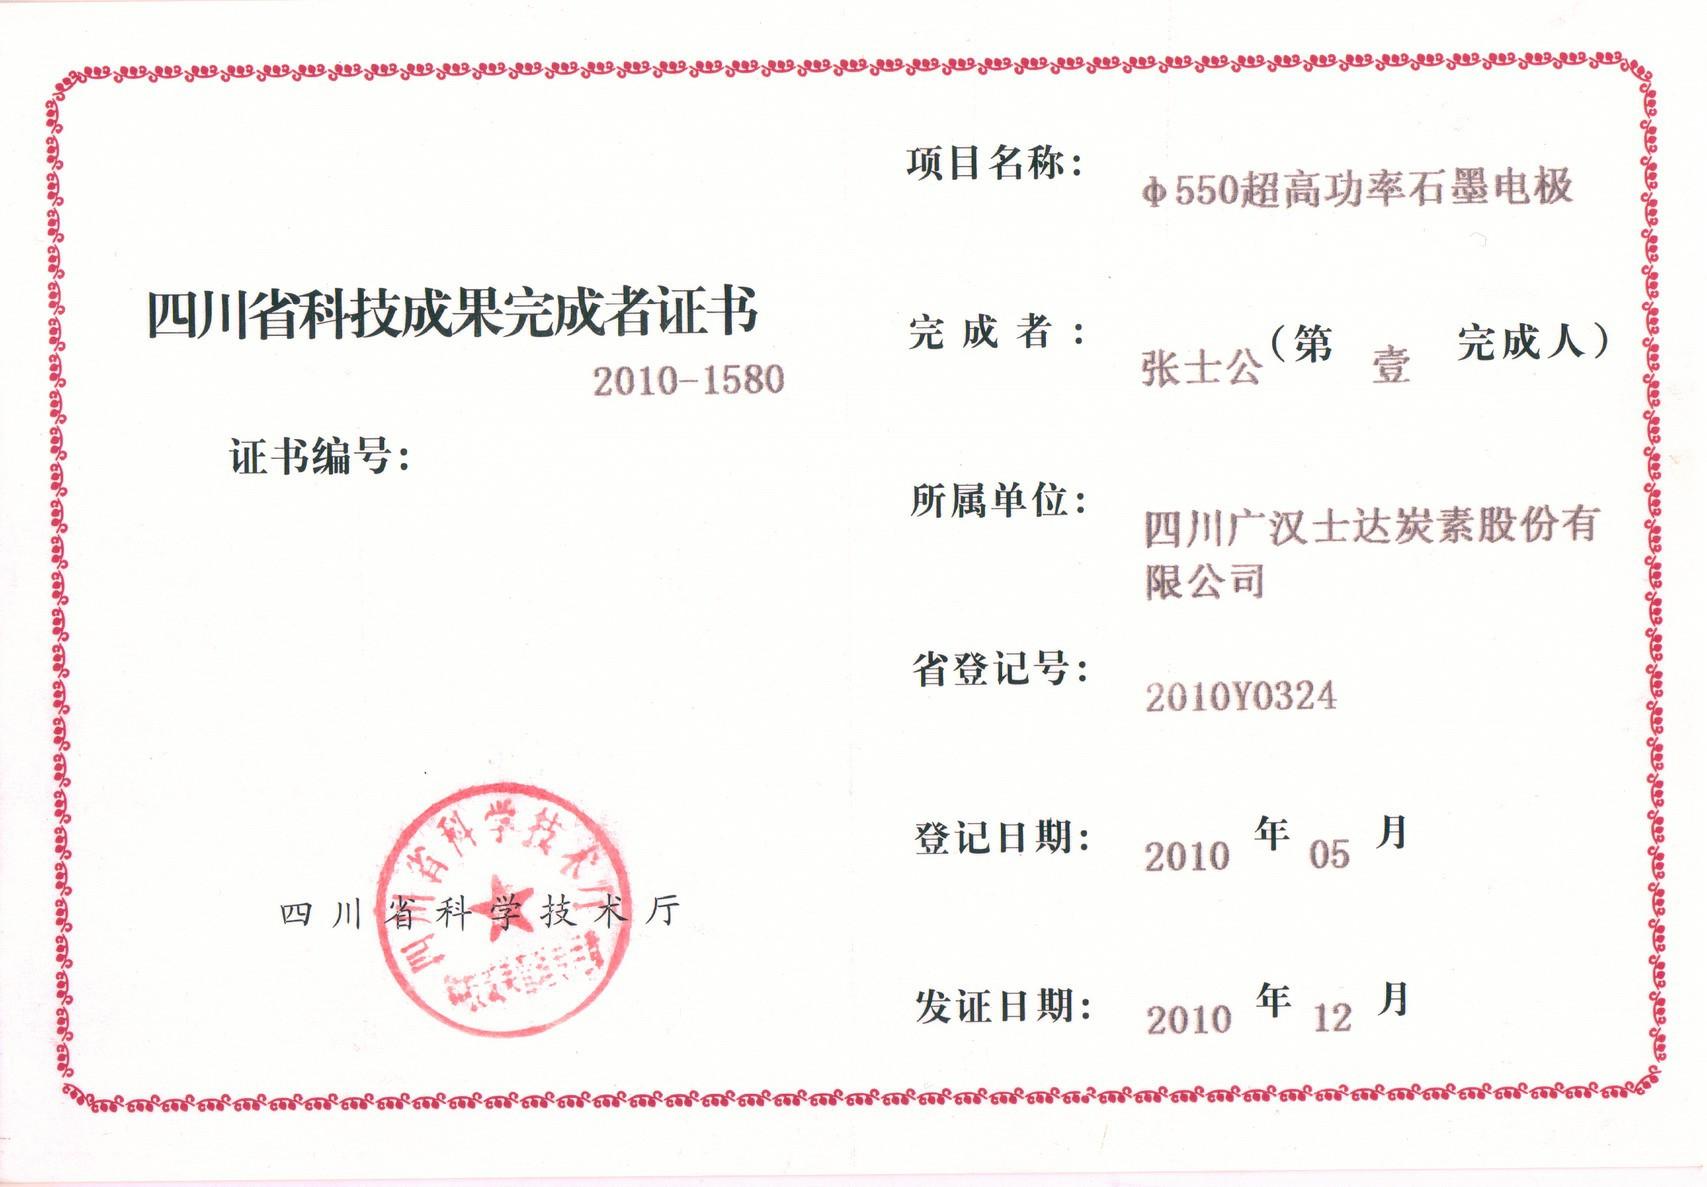 <span>四川省科技成果完成者证书</span>